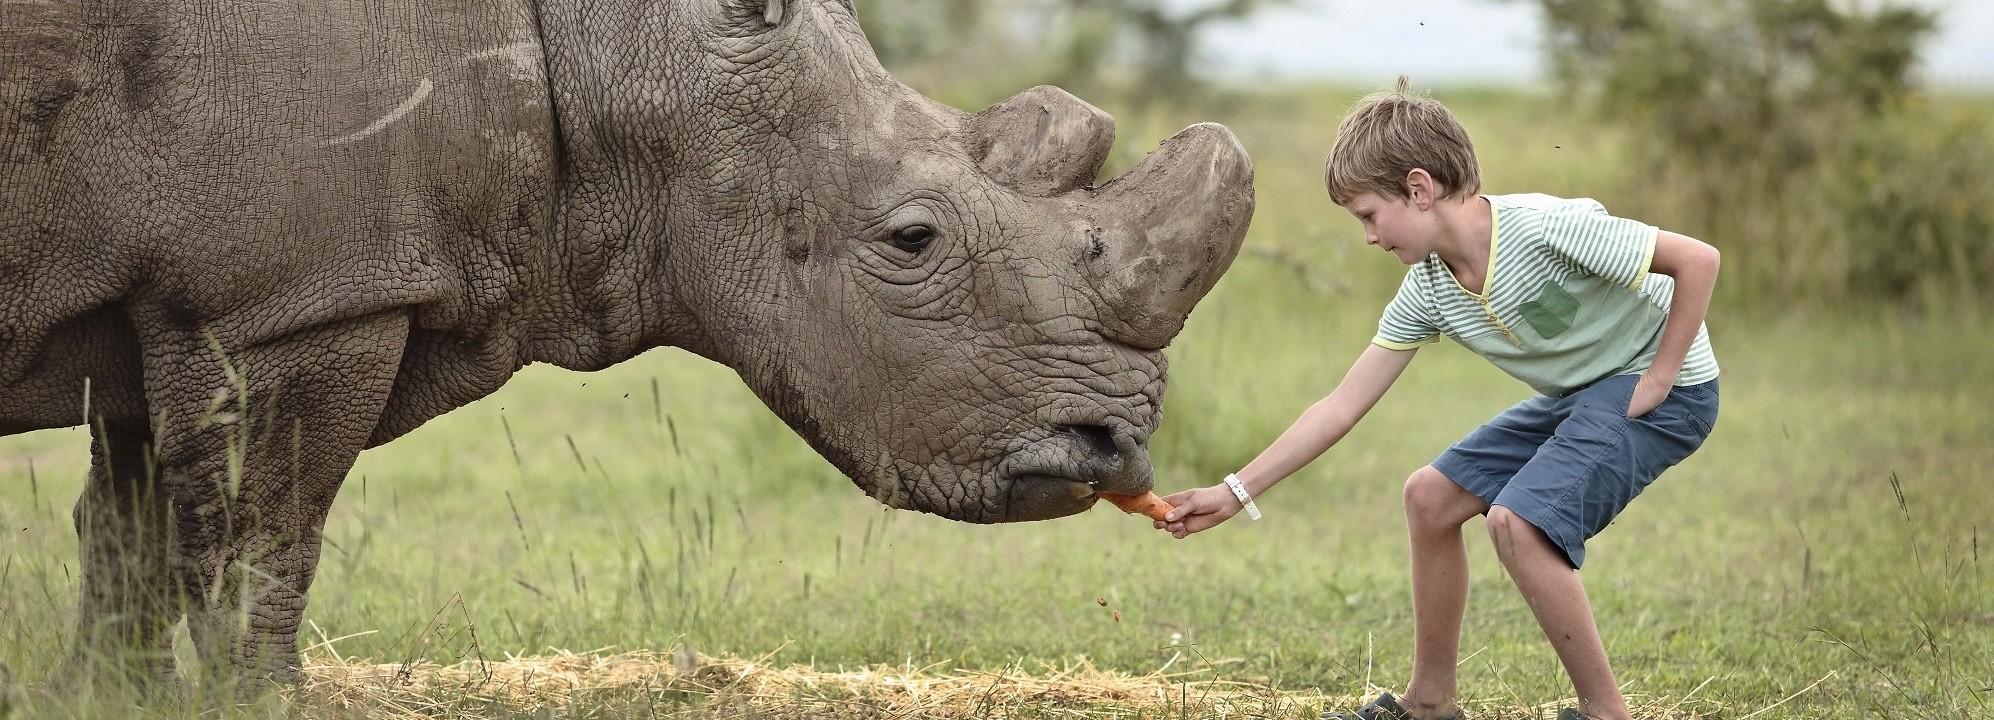 Boy interacting with rhino, Inspiring Encounters OPBC